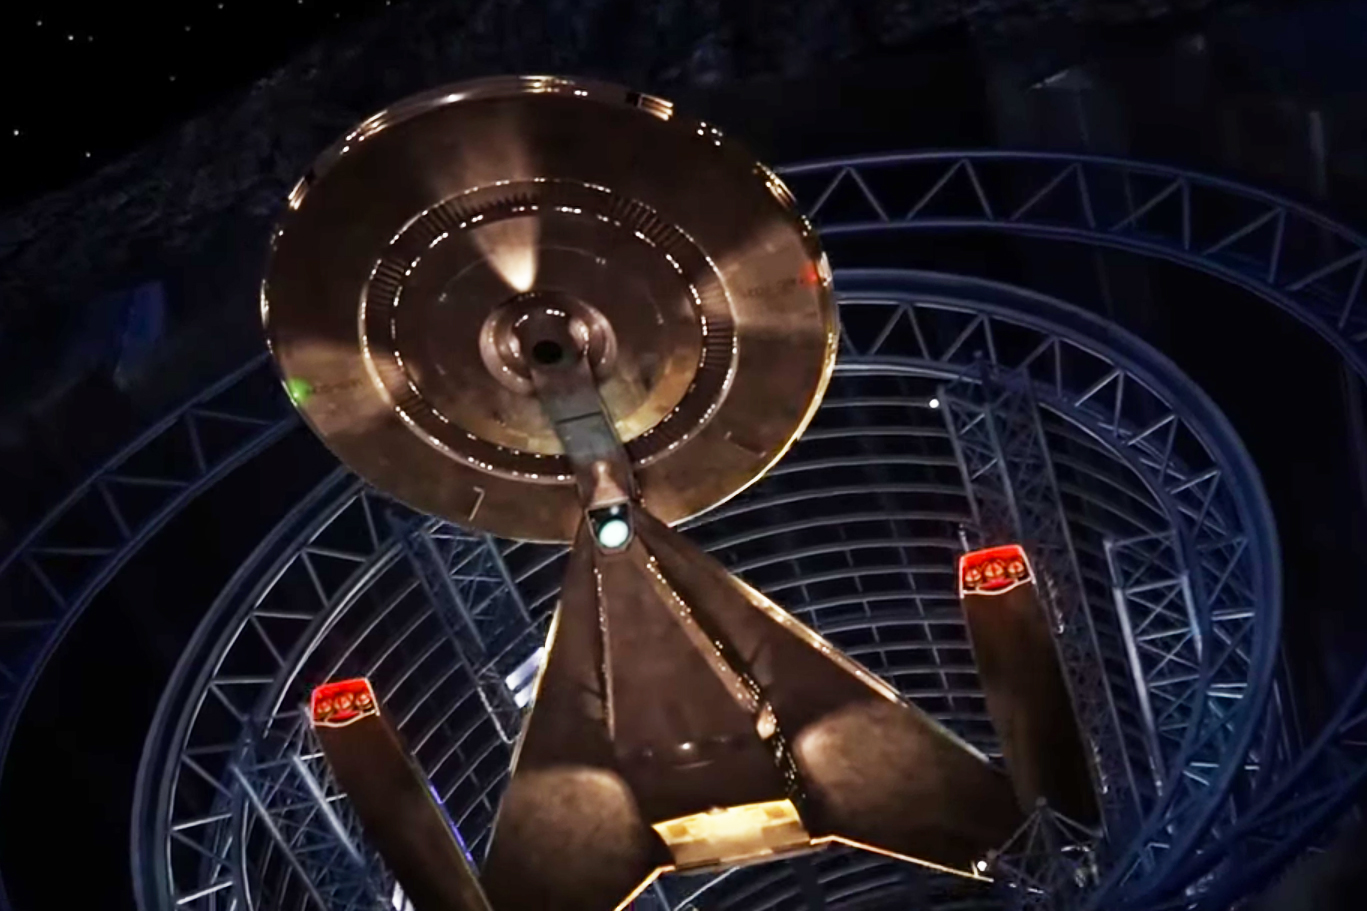 'Star Trek' Returns to TV in This New Teaser From CBS